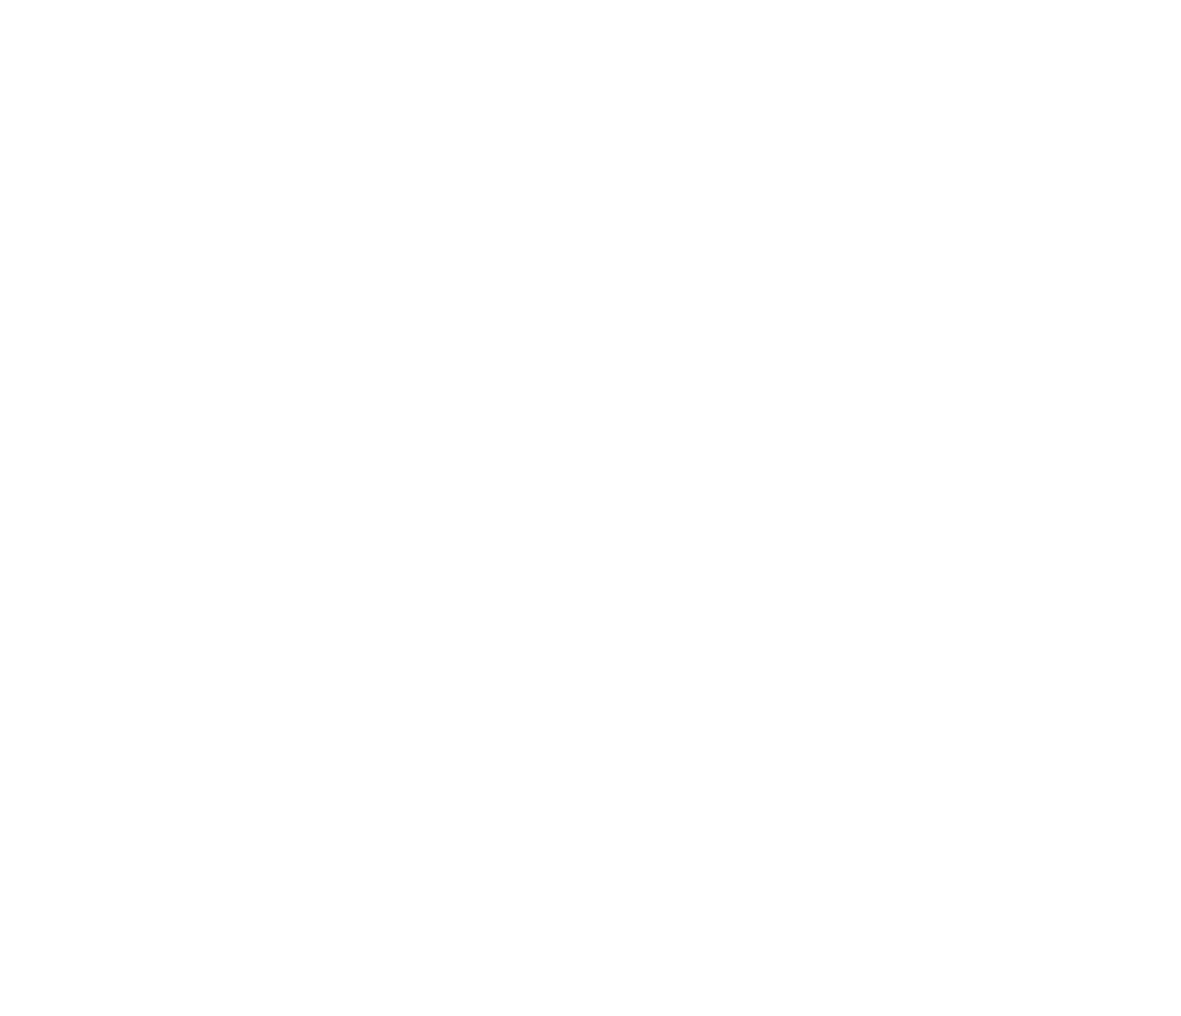 GyroProEvolution